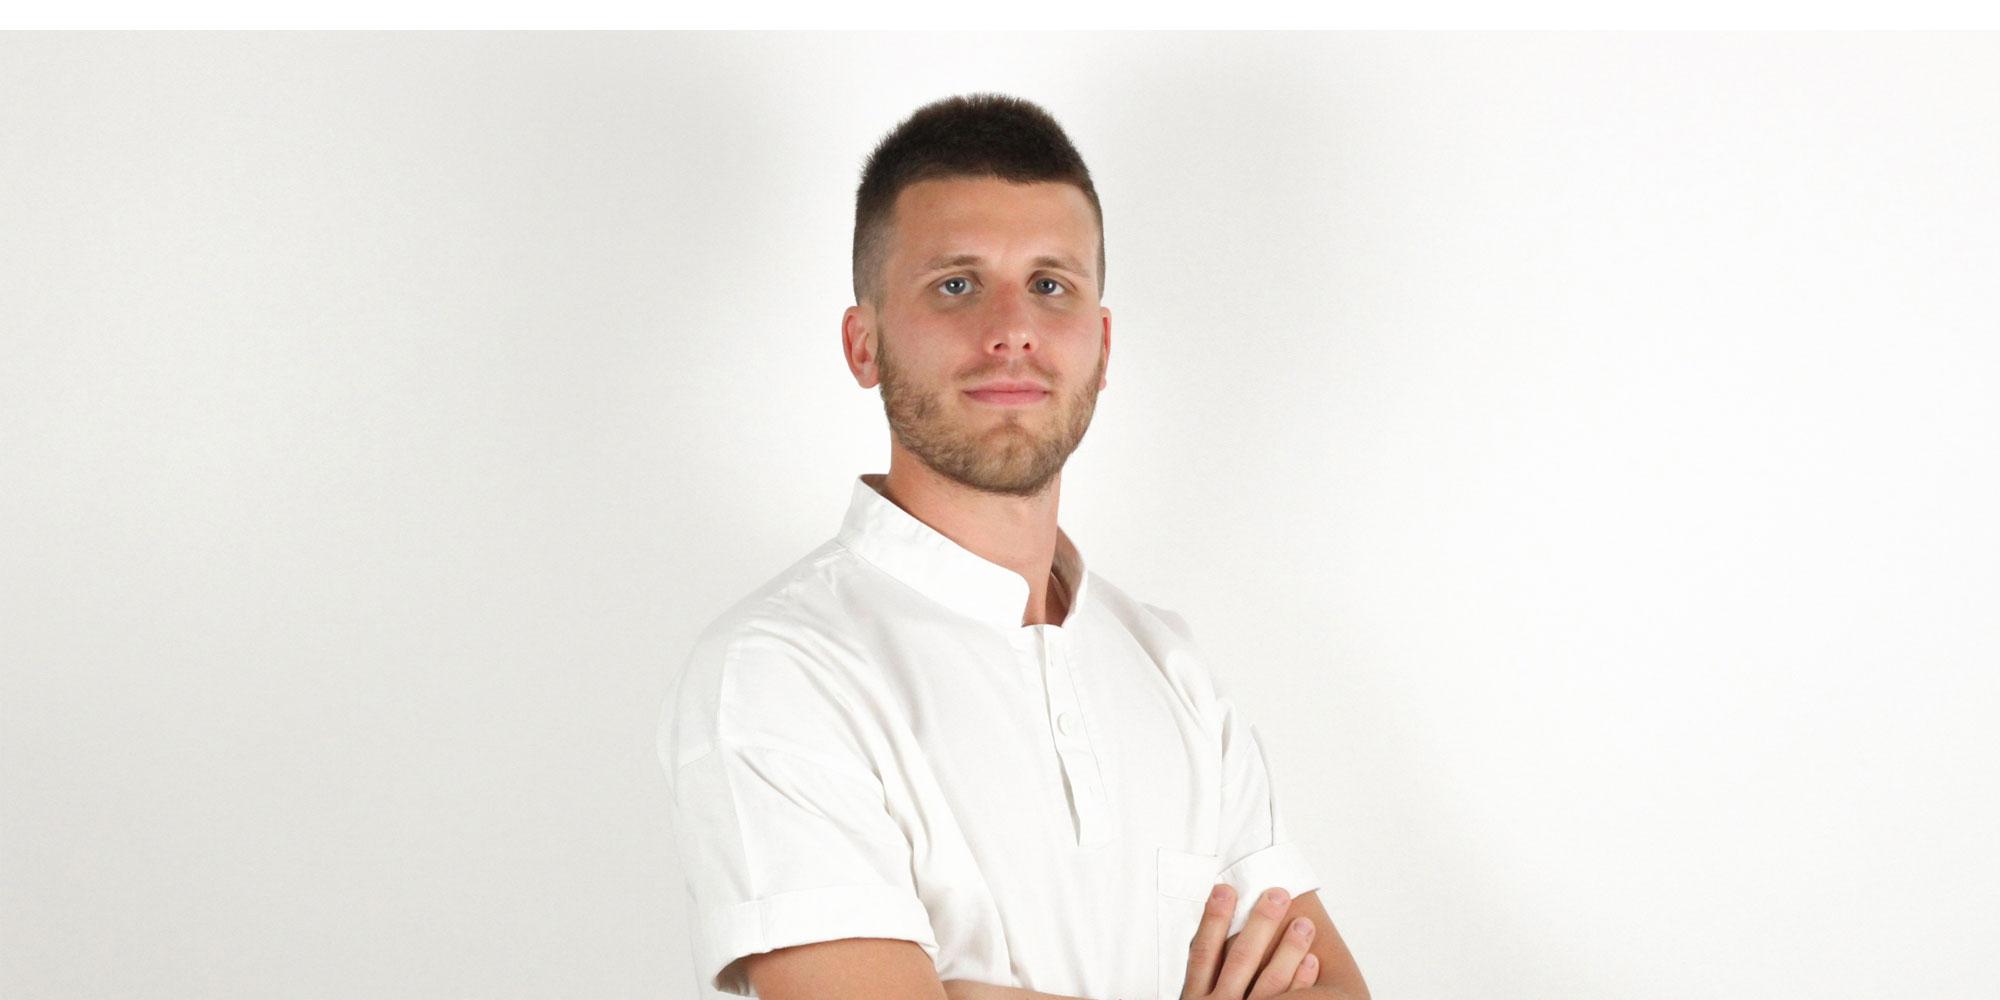 Michele Casero osteopata massoterapista